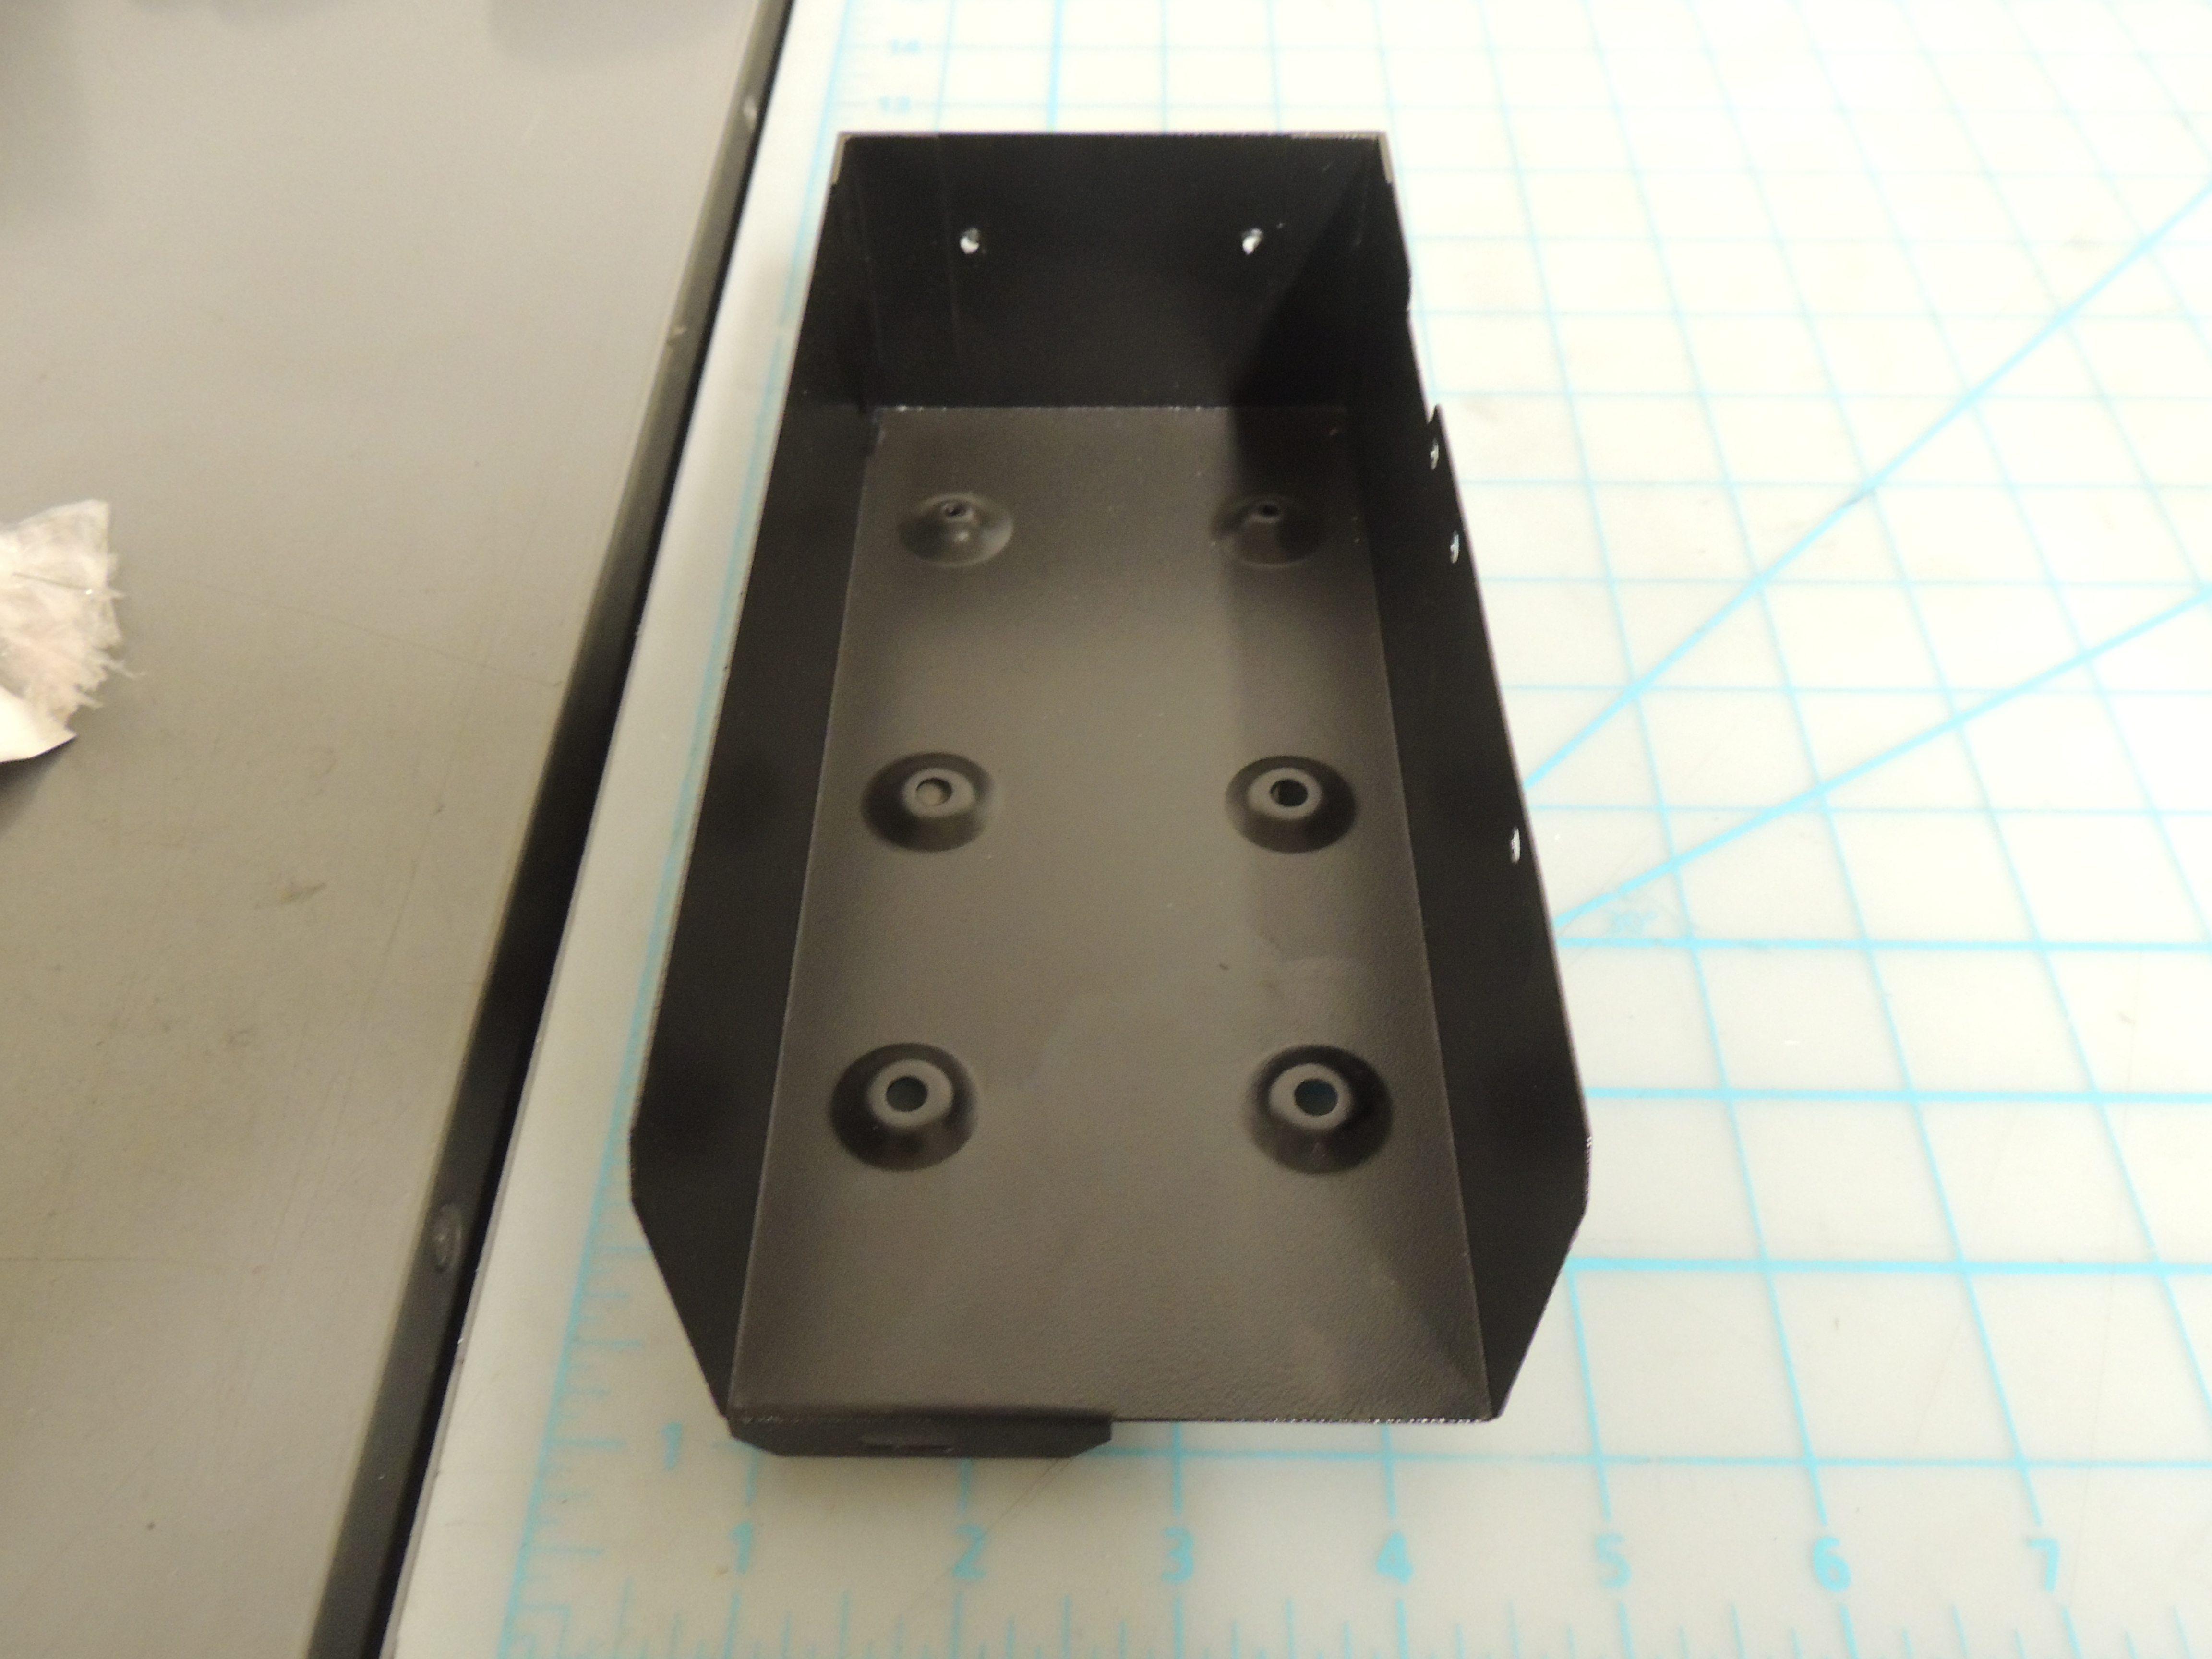 DWC1534 POWER BOX